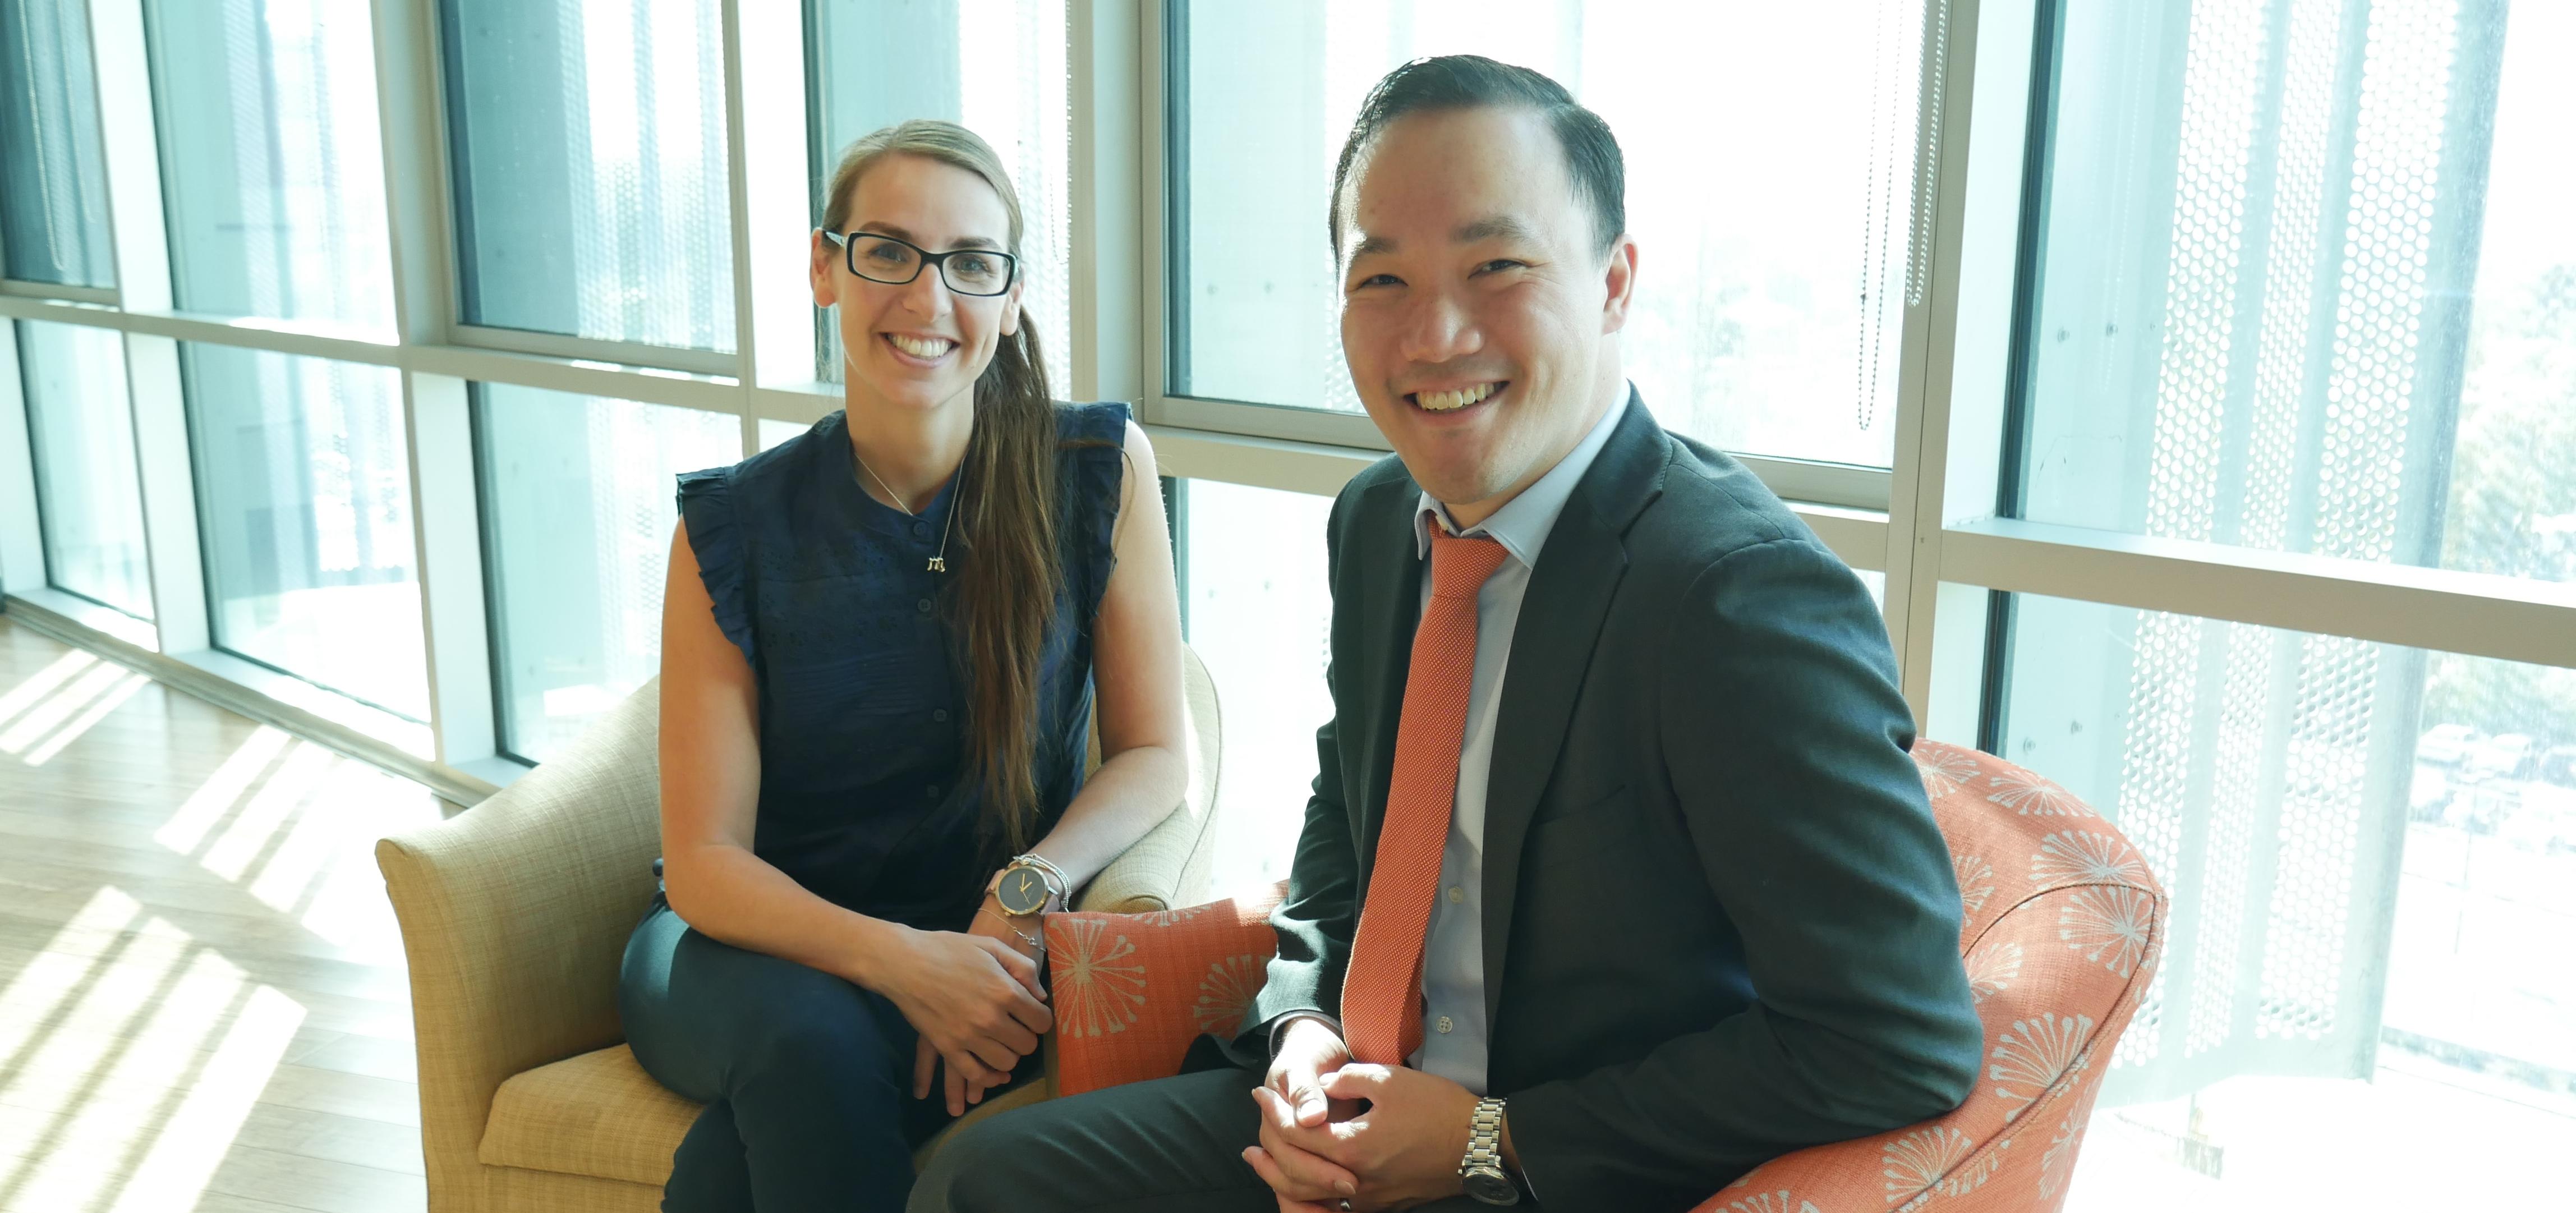 Chun Fong and Vanessa Donati